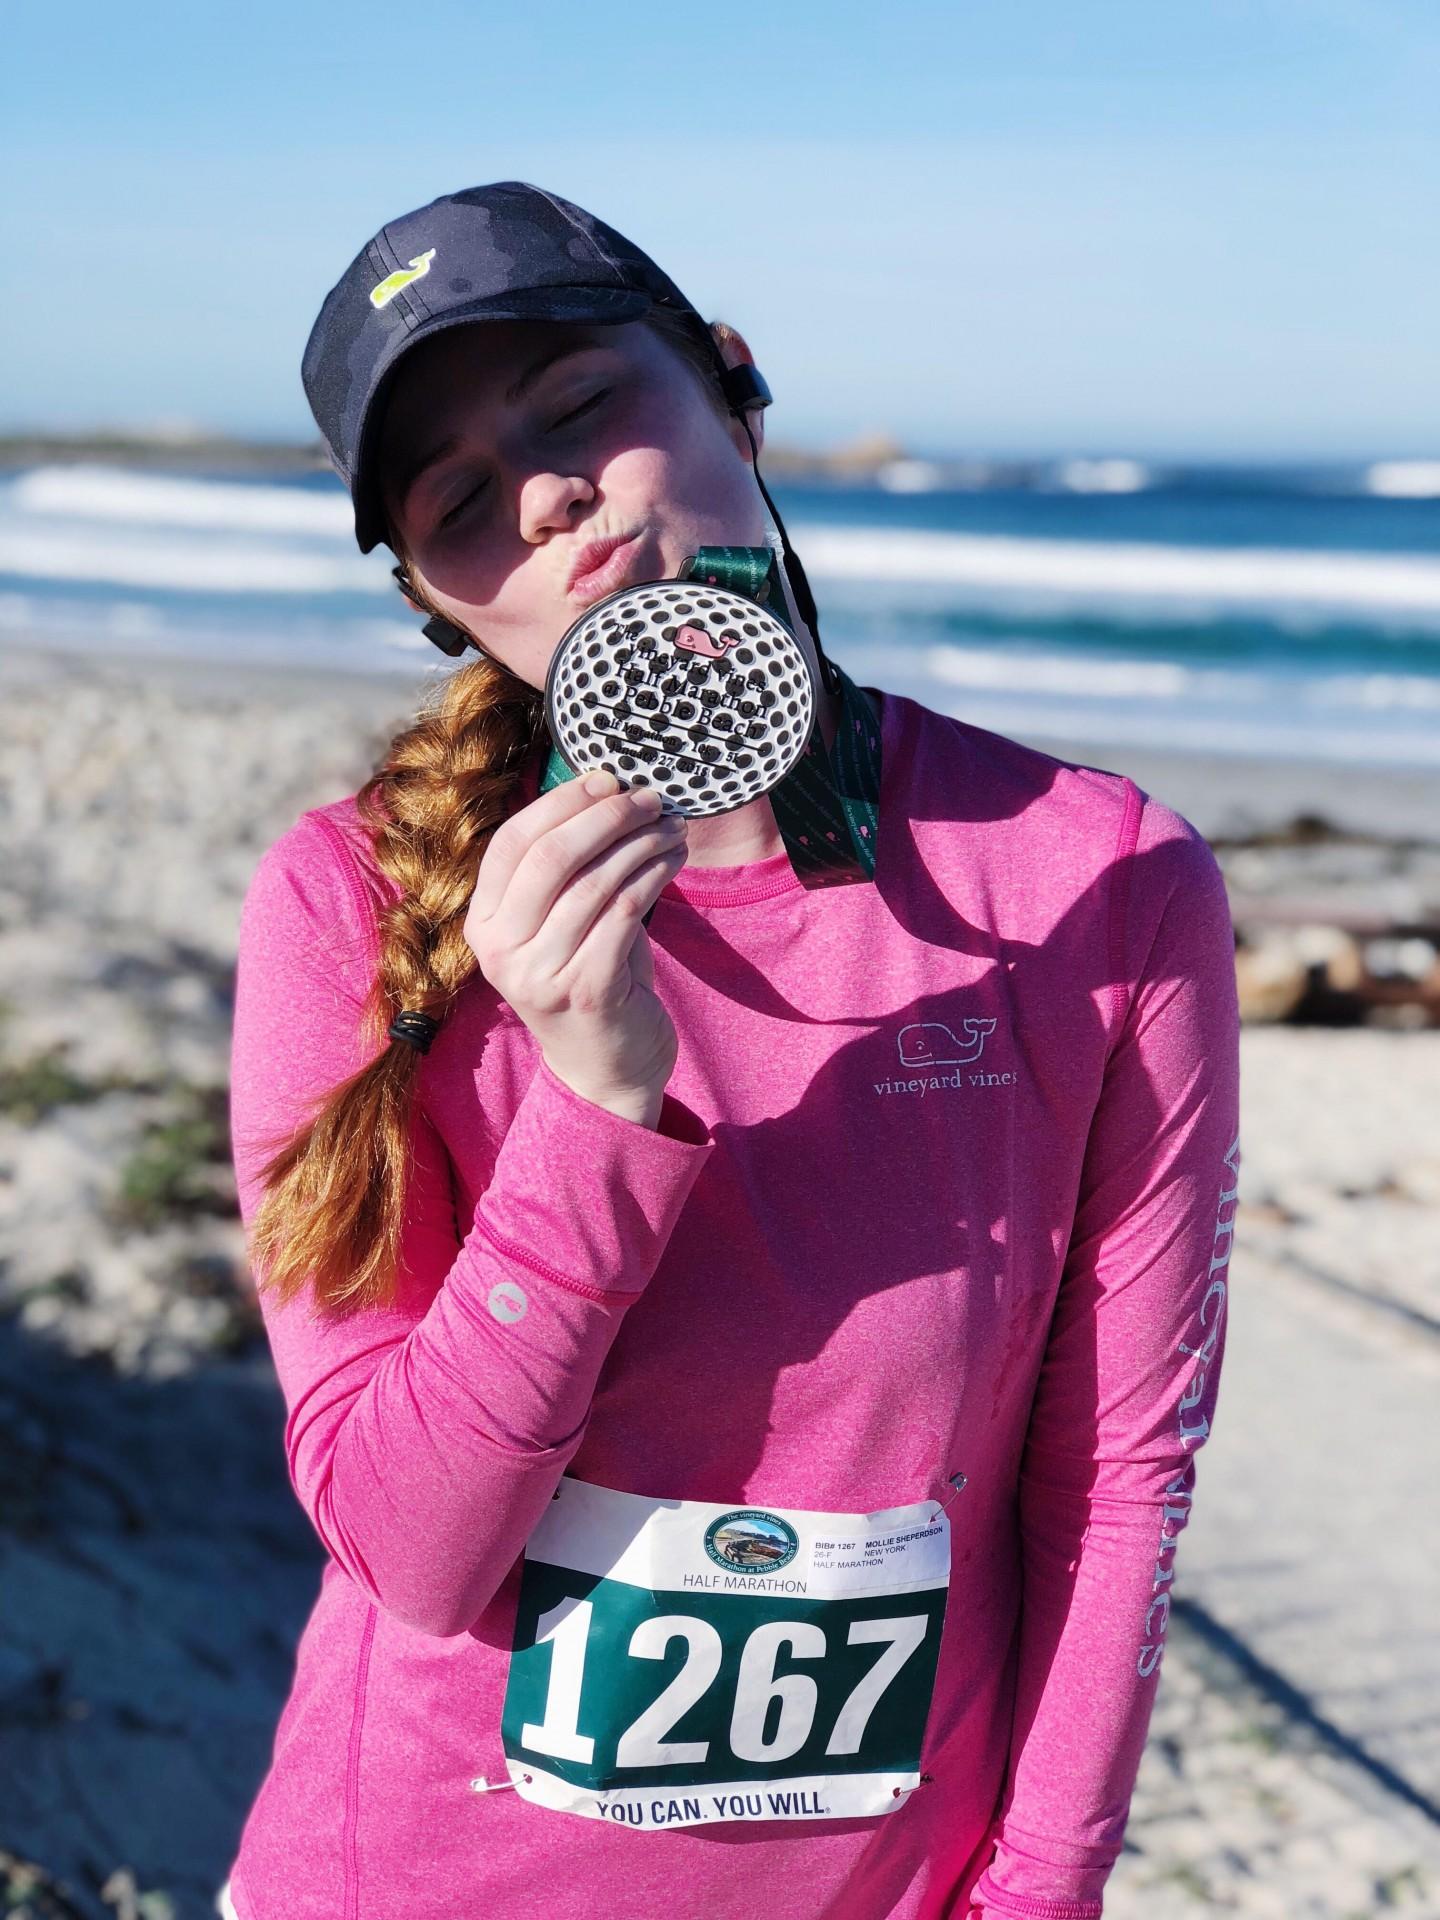 Lifestyle blogger Mollie Moore runs the Vineyard Vines Pebble Beach half marathon